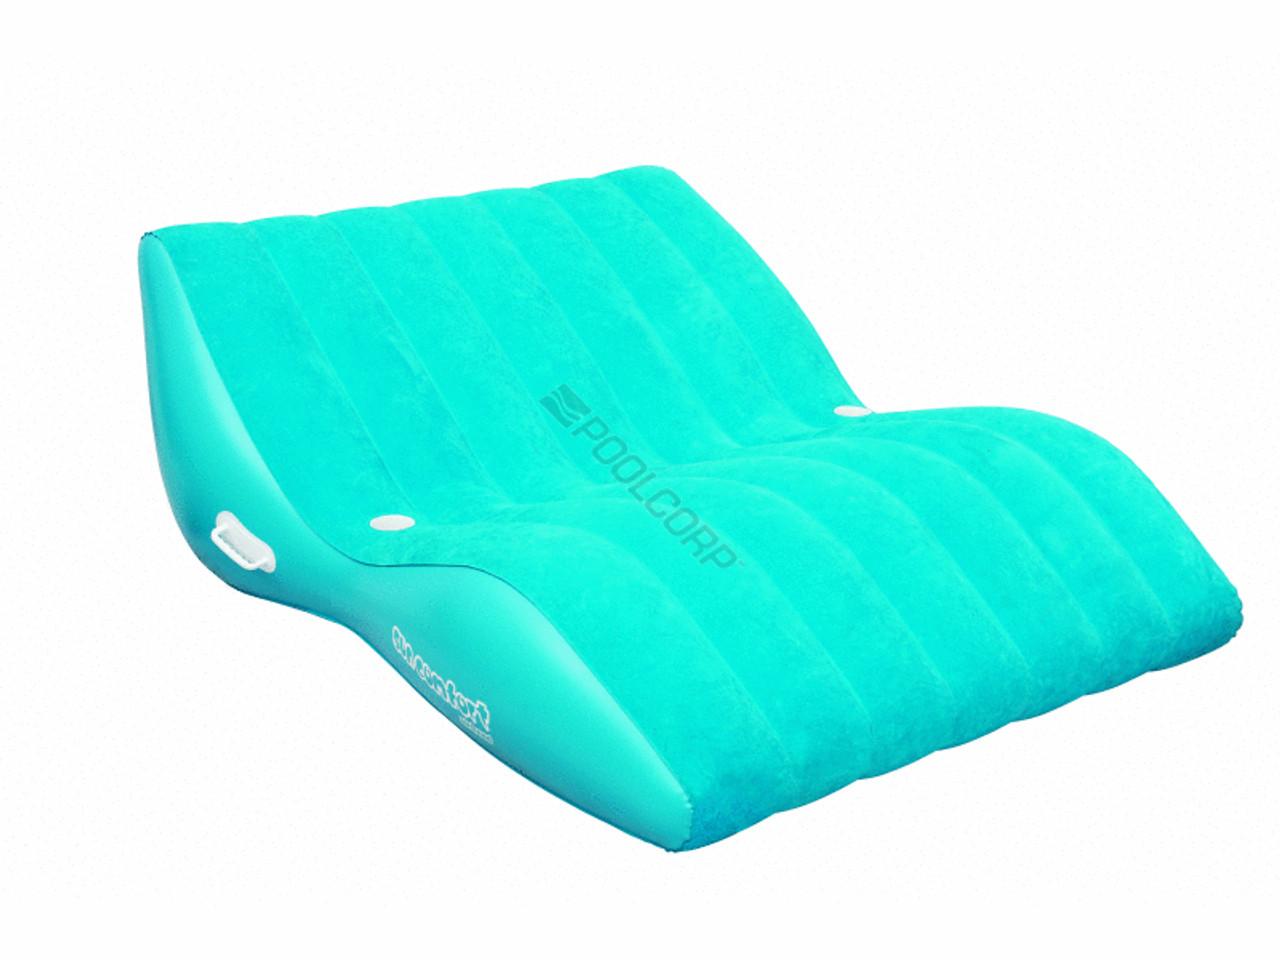 ff4bef1fb65 3 Cs Sapphire Cool Suede Dbl Zero Gravity Lounge